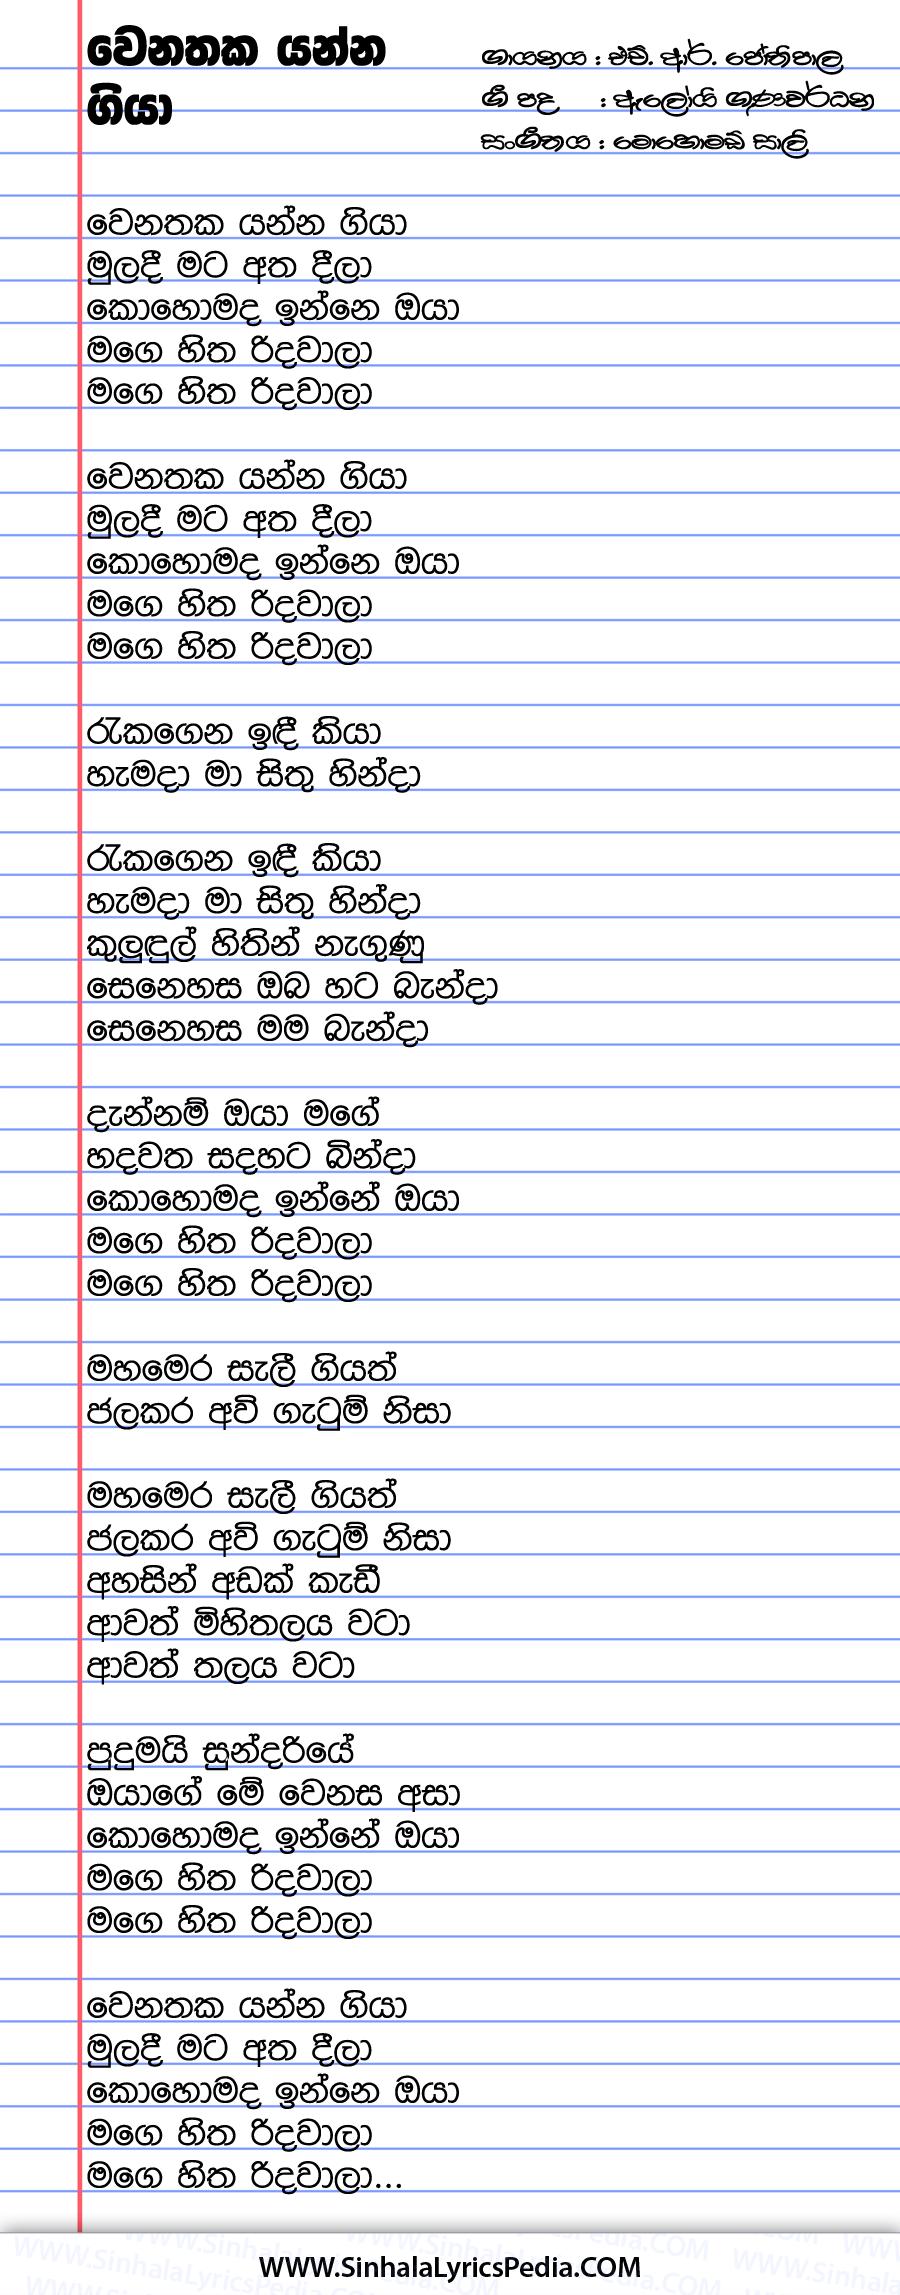 Wenathaka Yanna Giya Muladi Atha Deela Song Lyrics